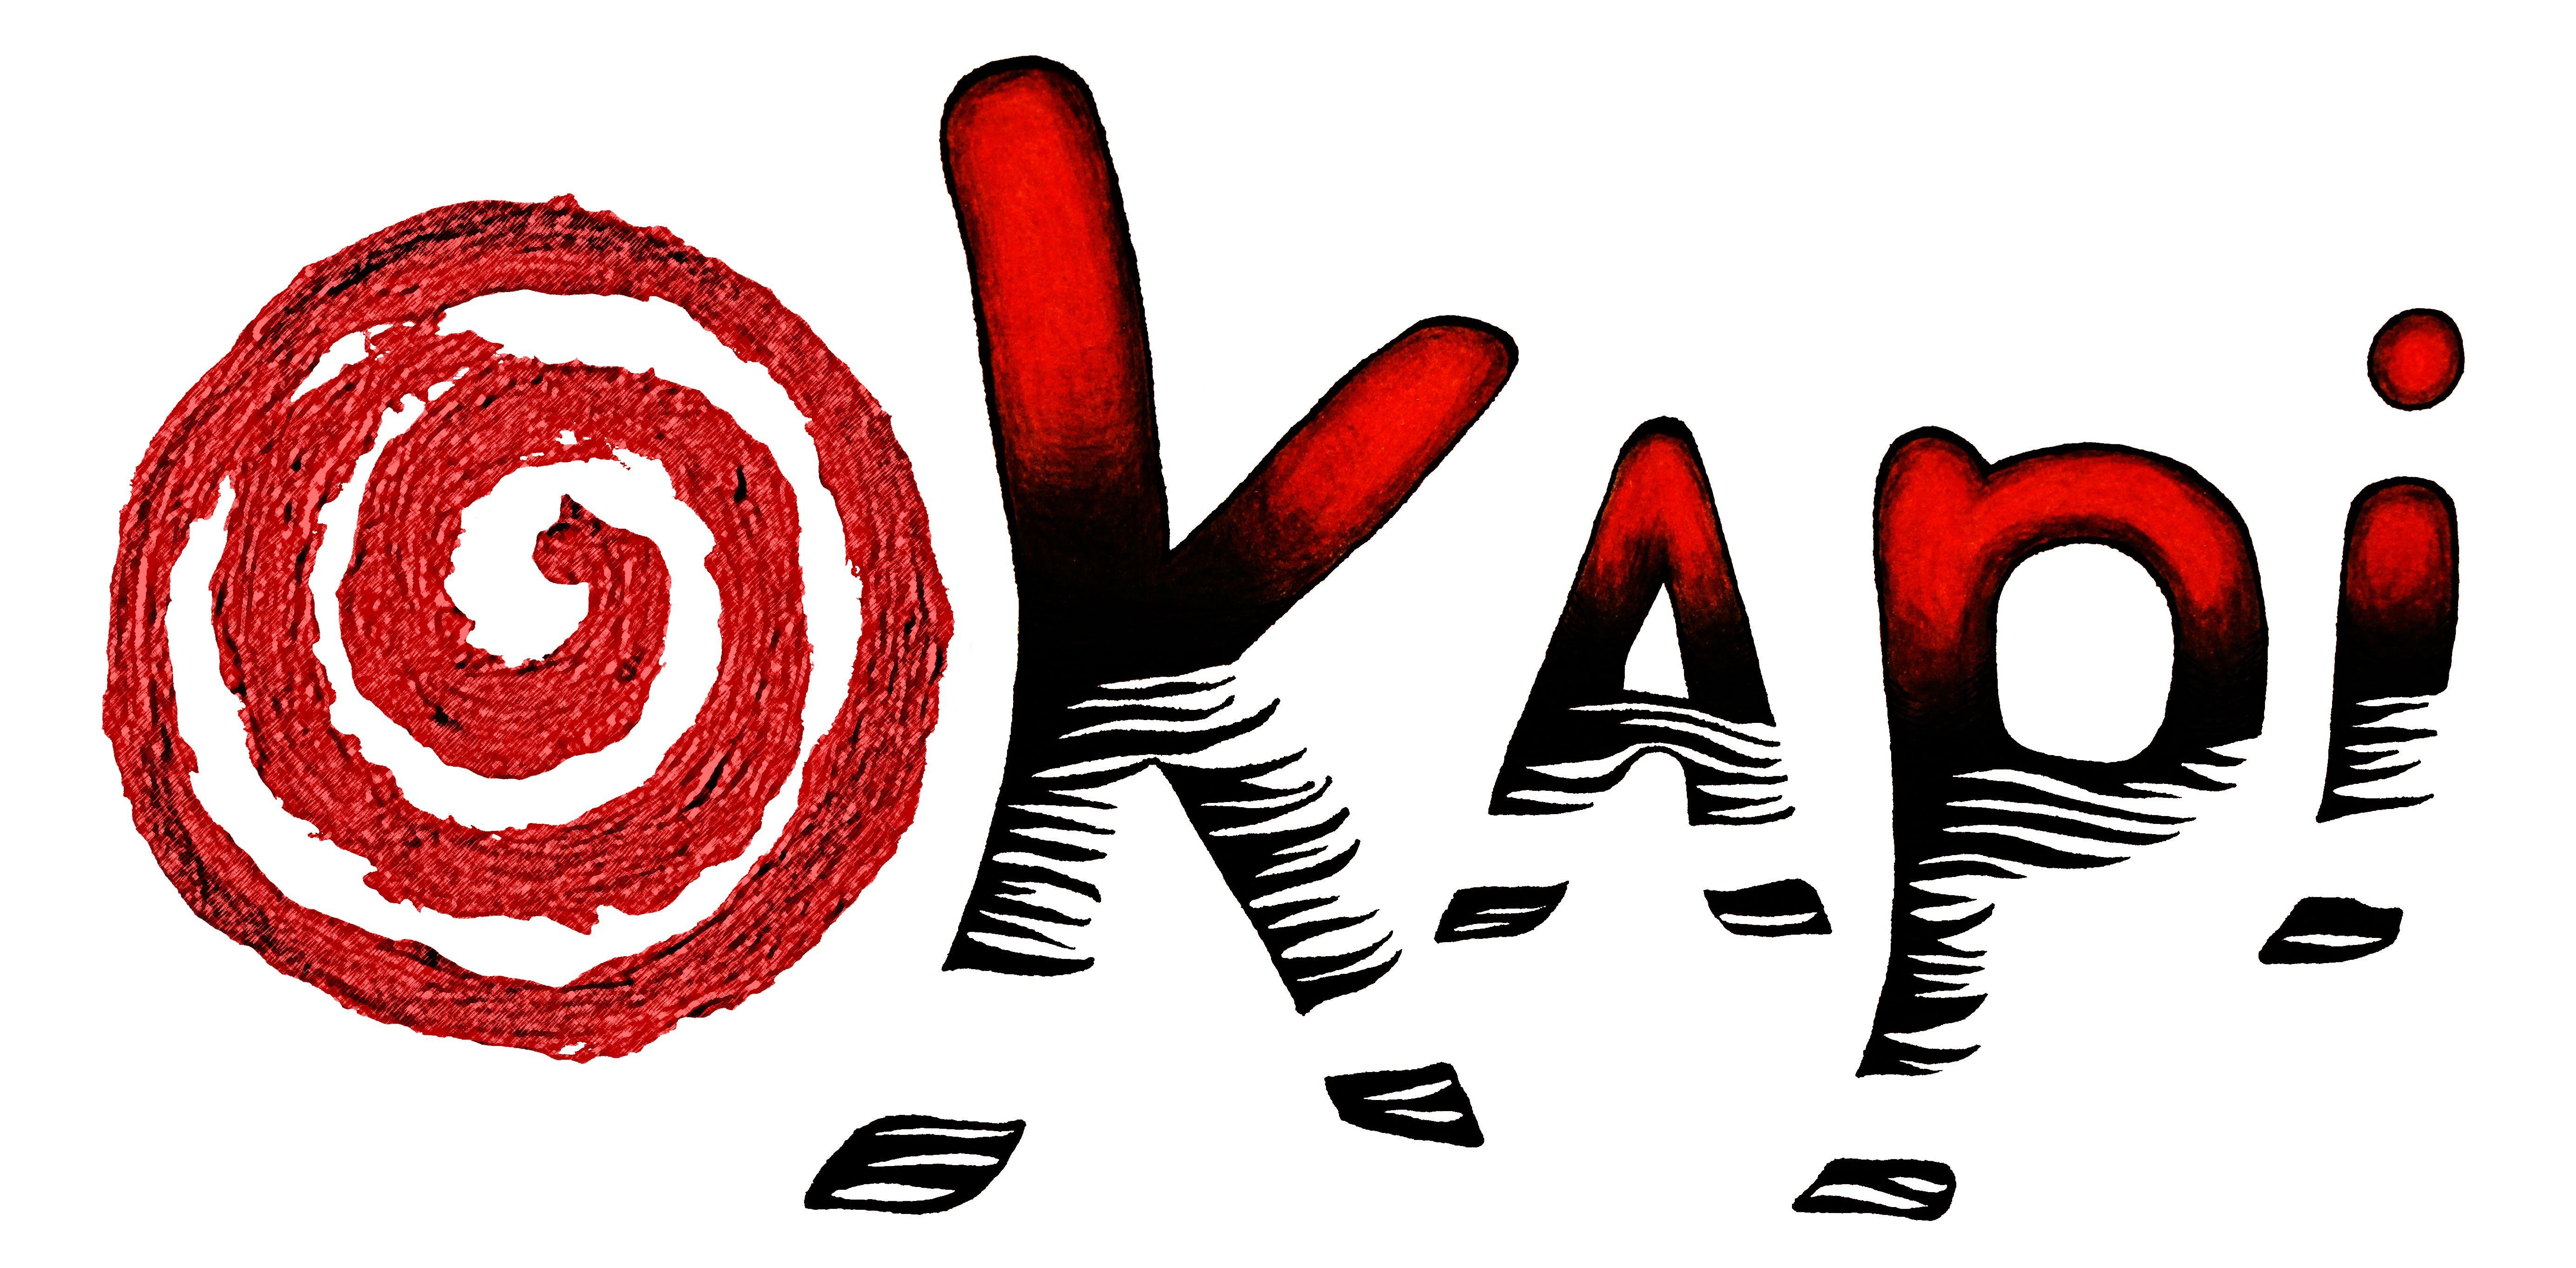 The Okapi Fan Control System Brand | The Okapi Fan Control System